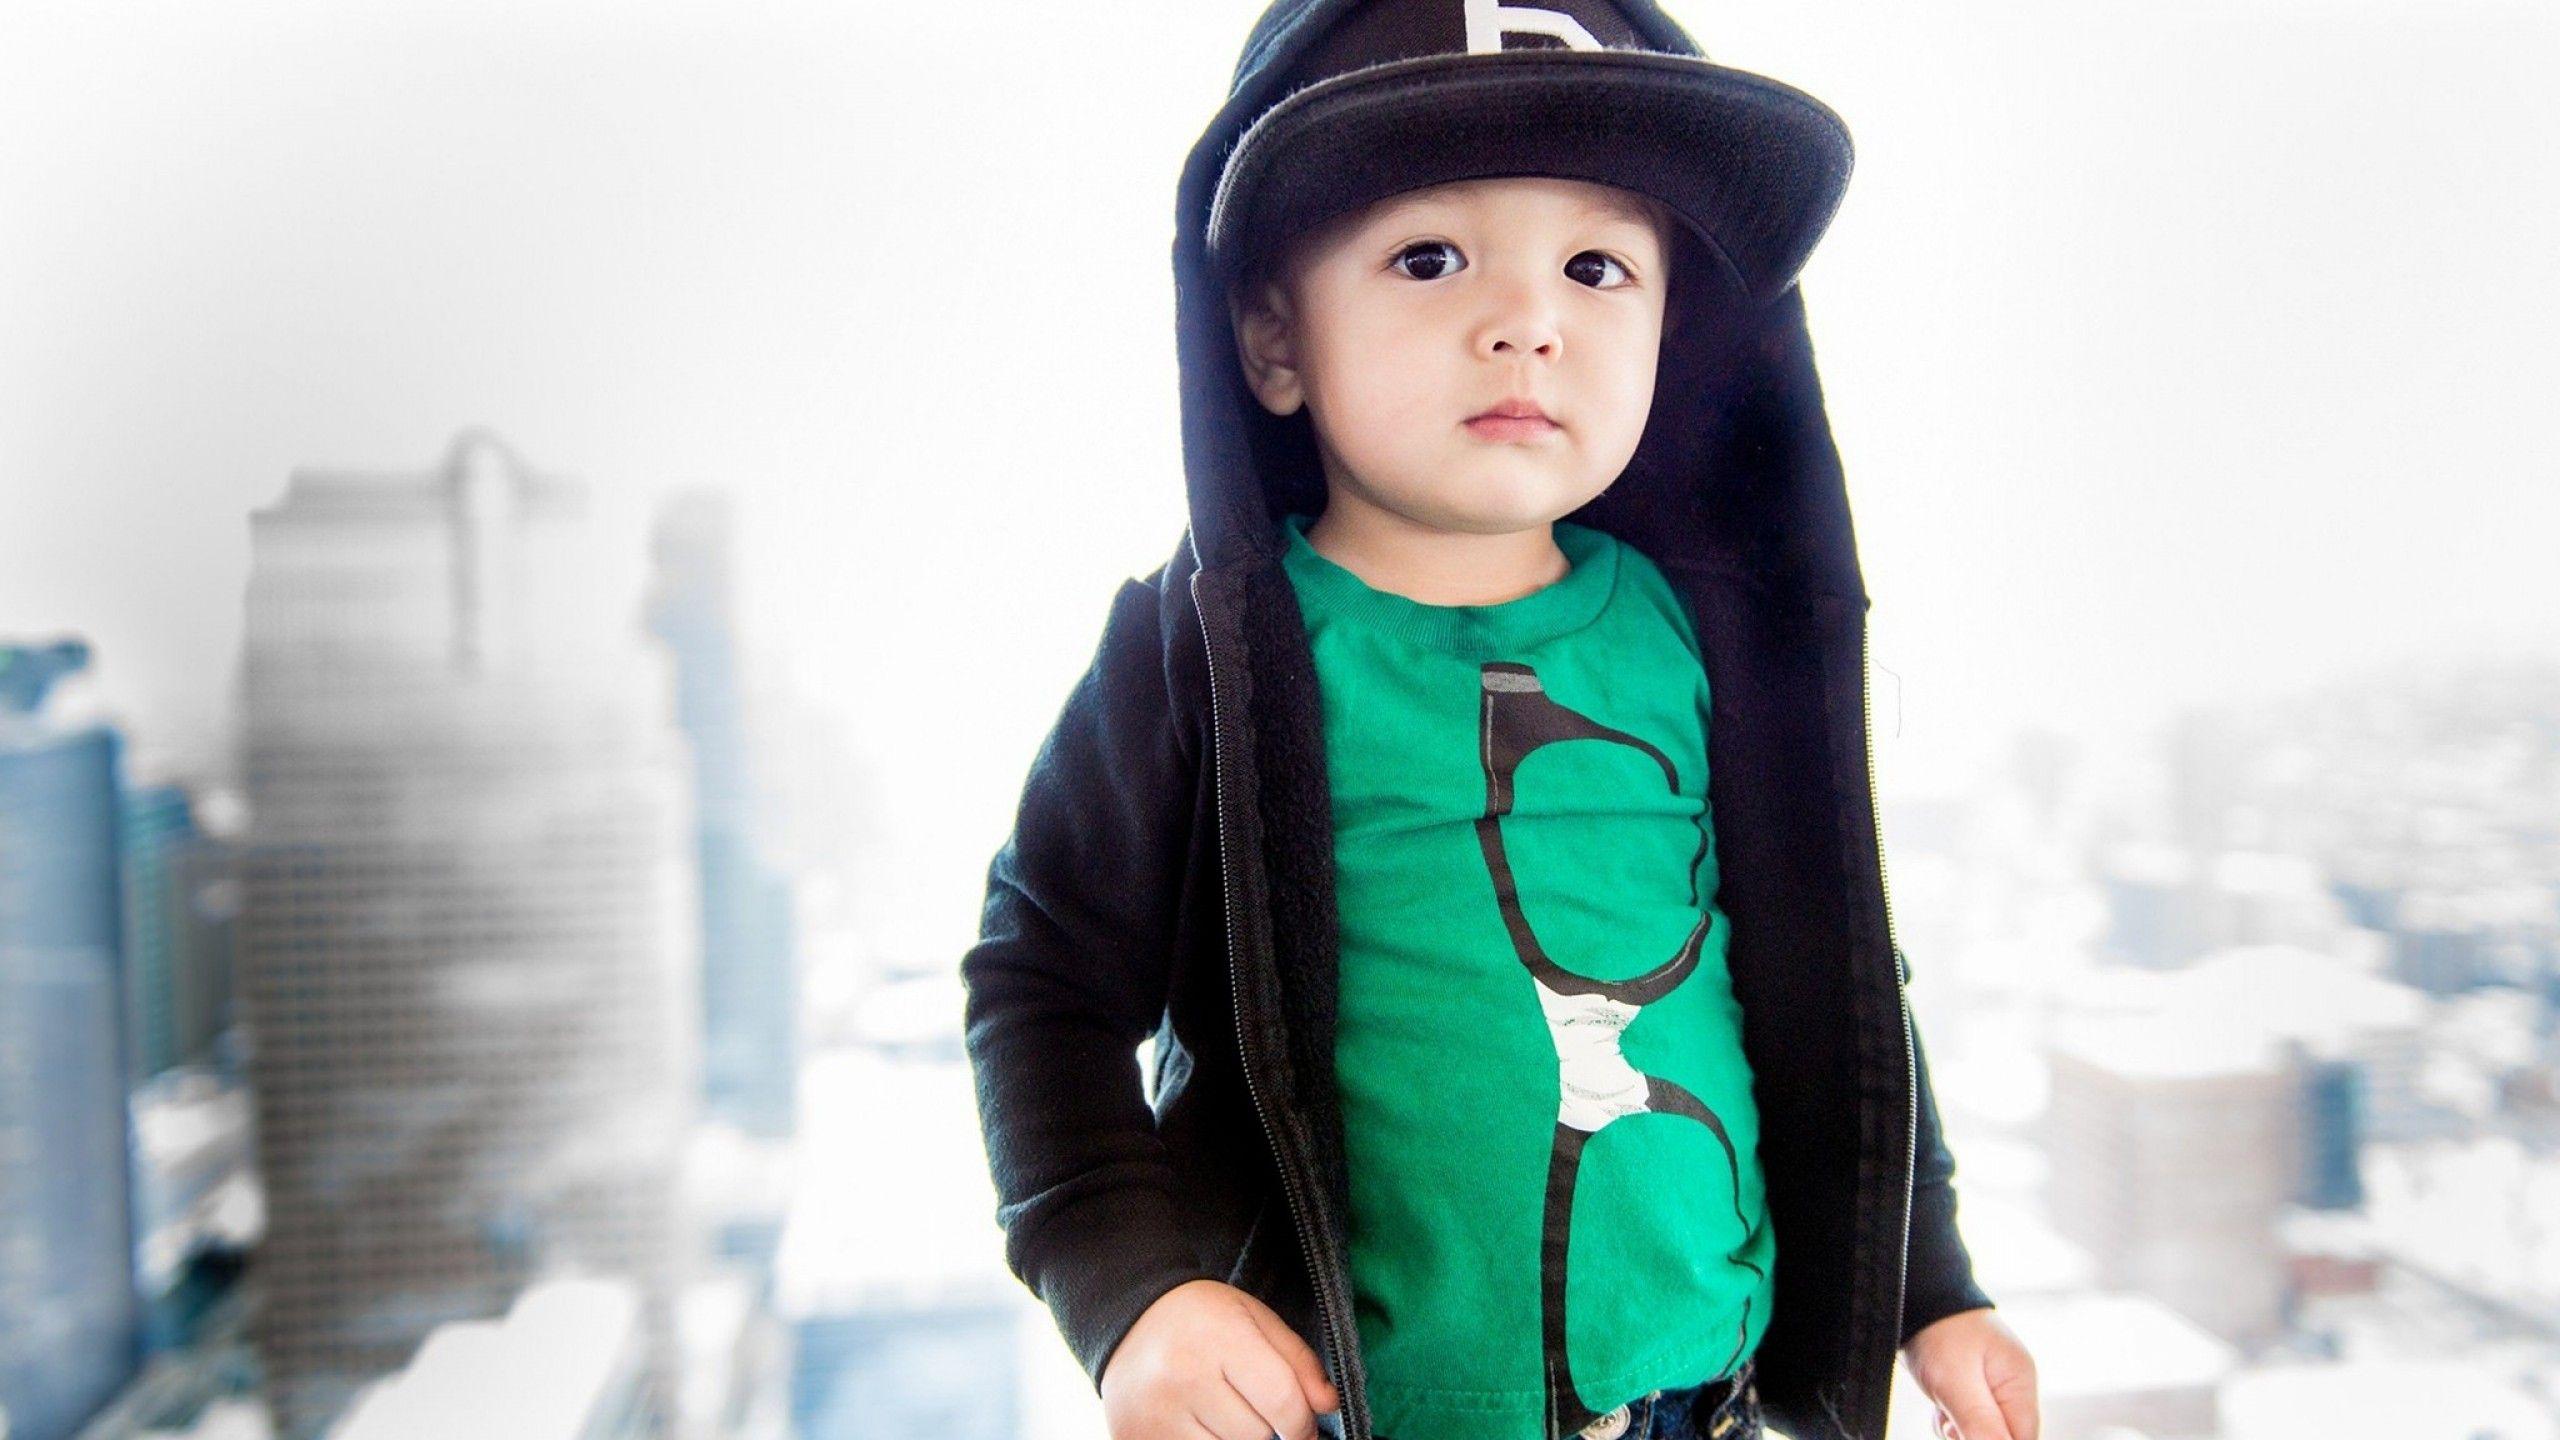 Hd wallpaper boy - Cool Baby Boy Stylish Wallpaper